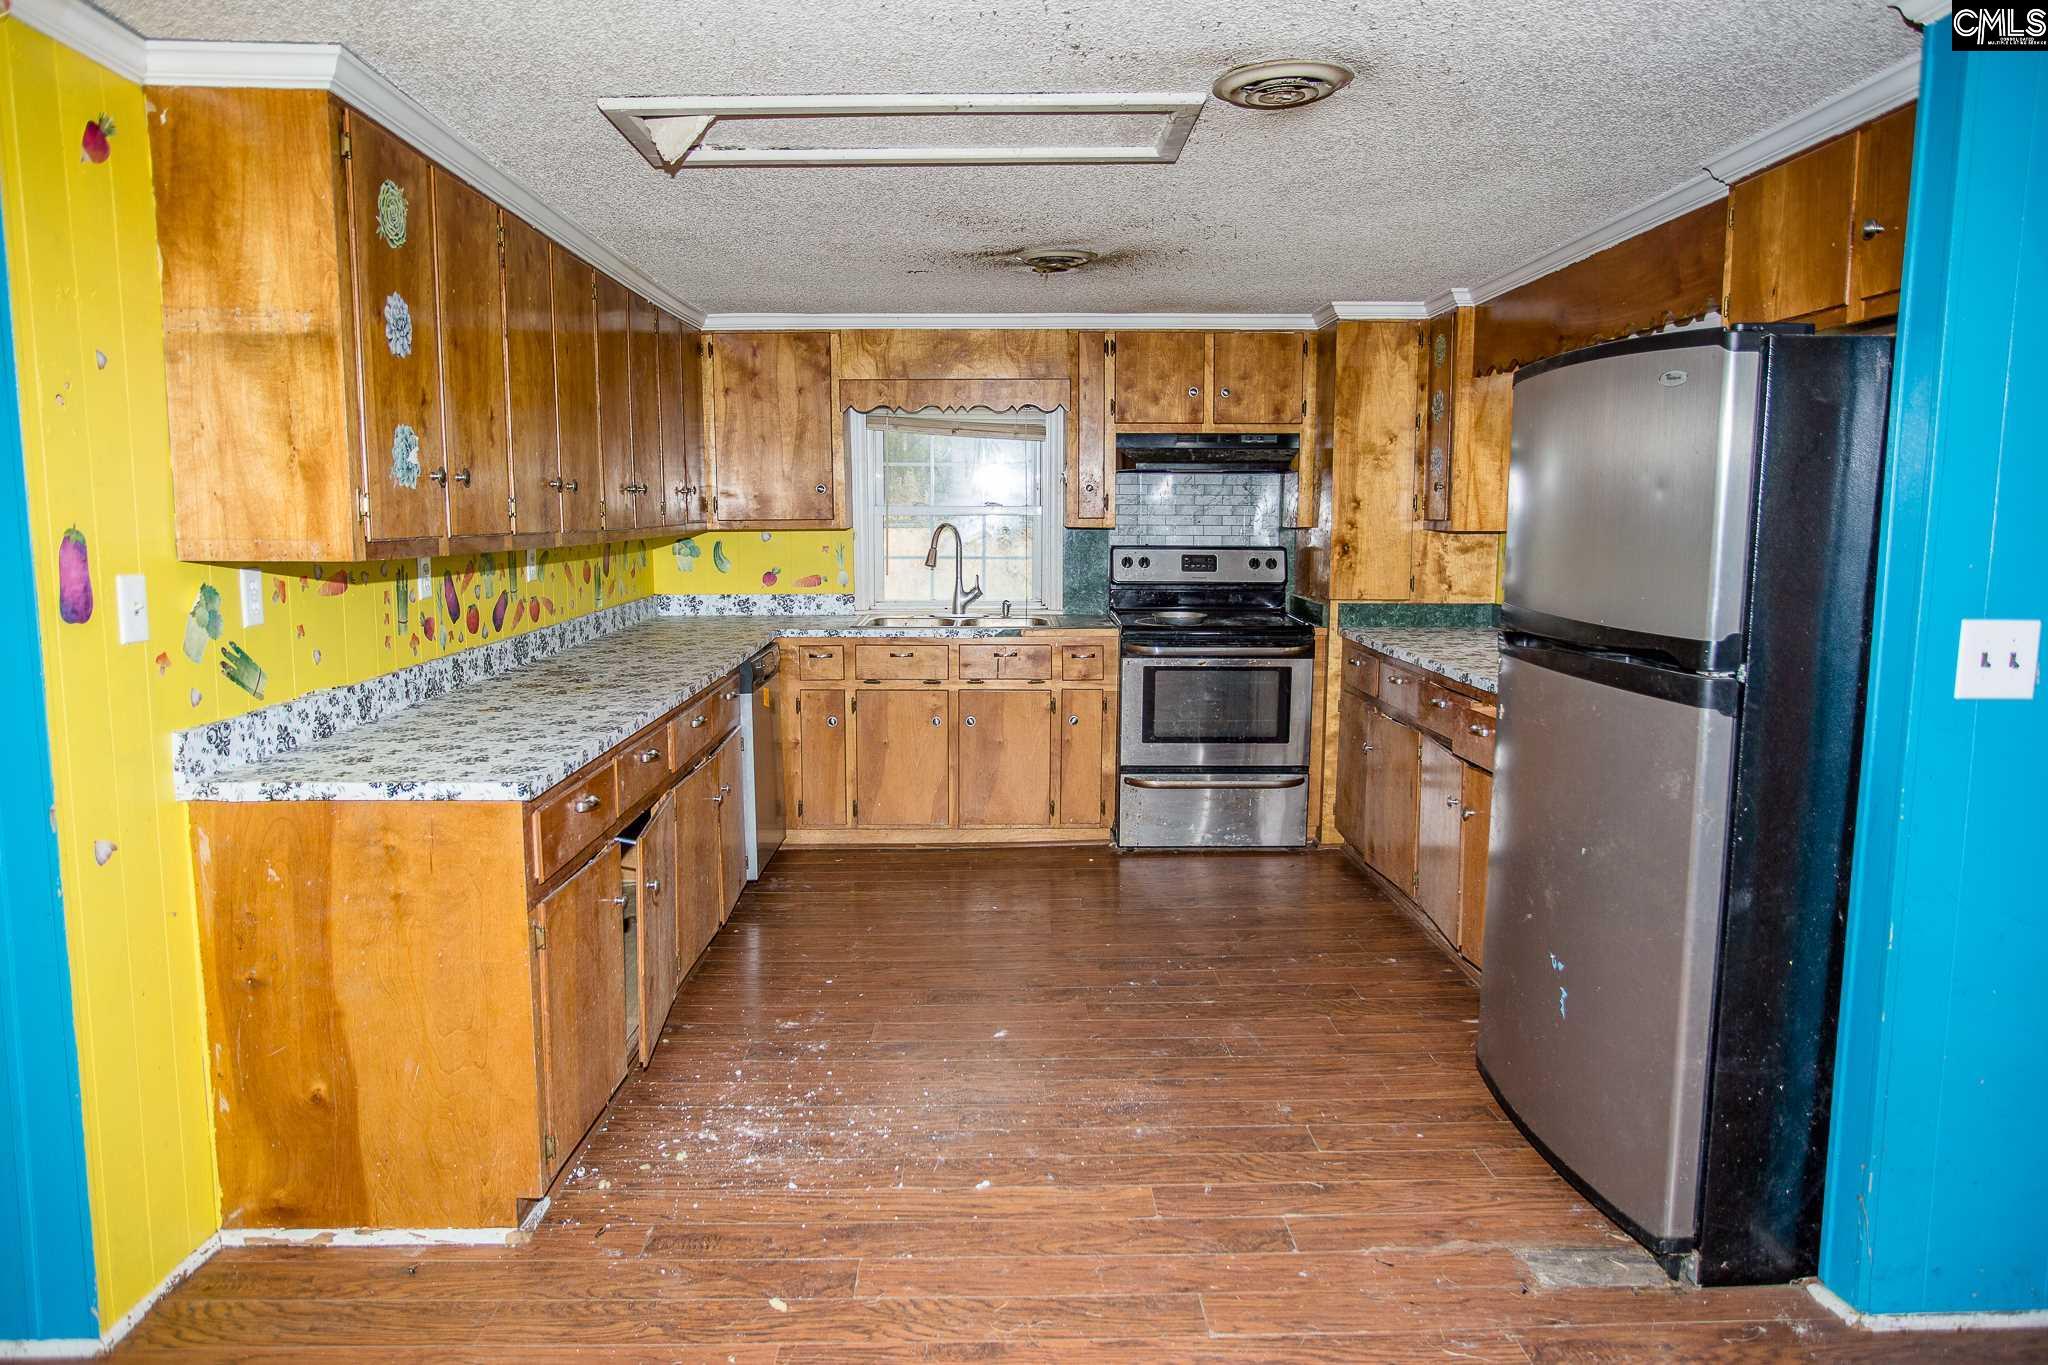 155 Ramblin Road West Columbia, SC 29170-3837